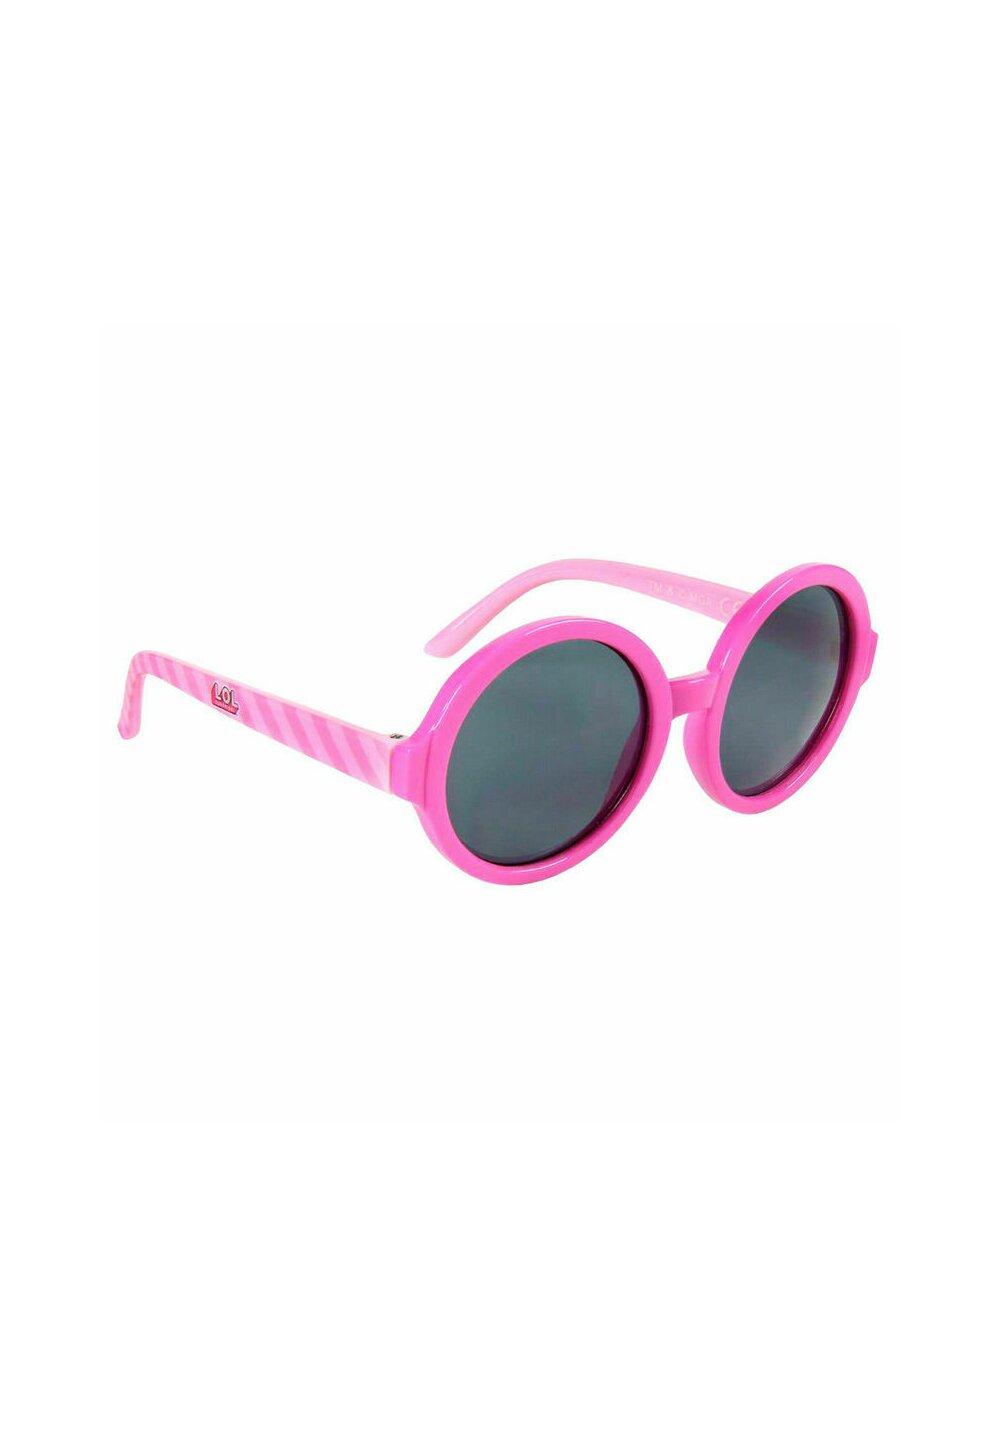 Ochelari de soare, Lol surprise, roz imagine